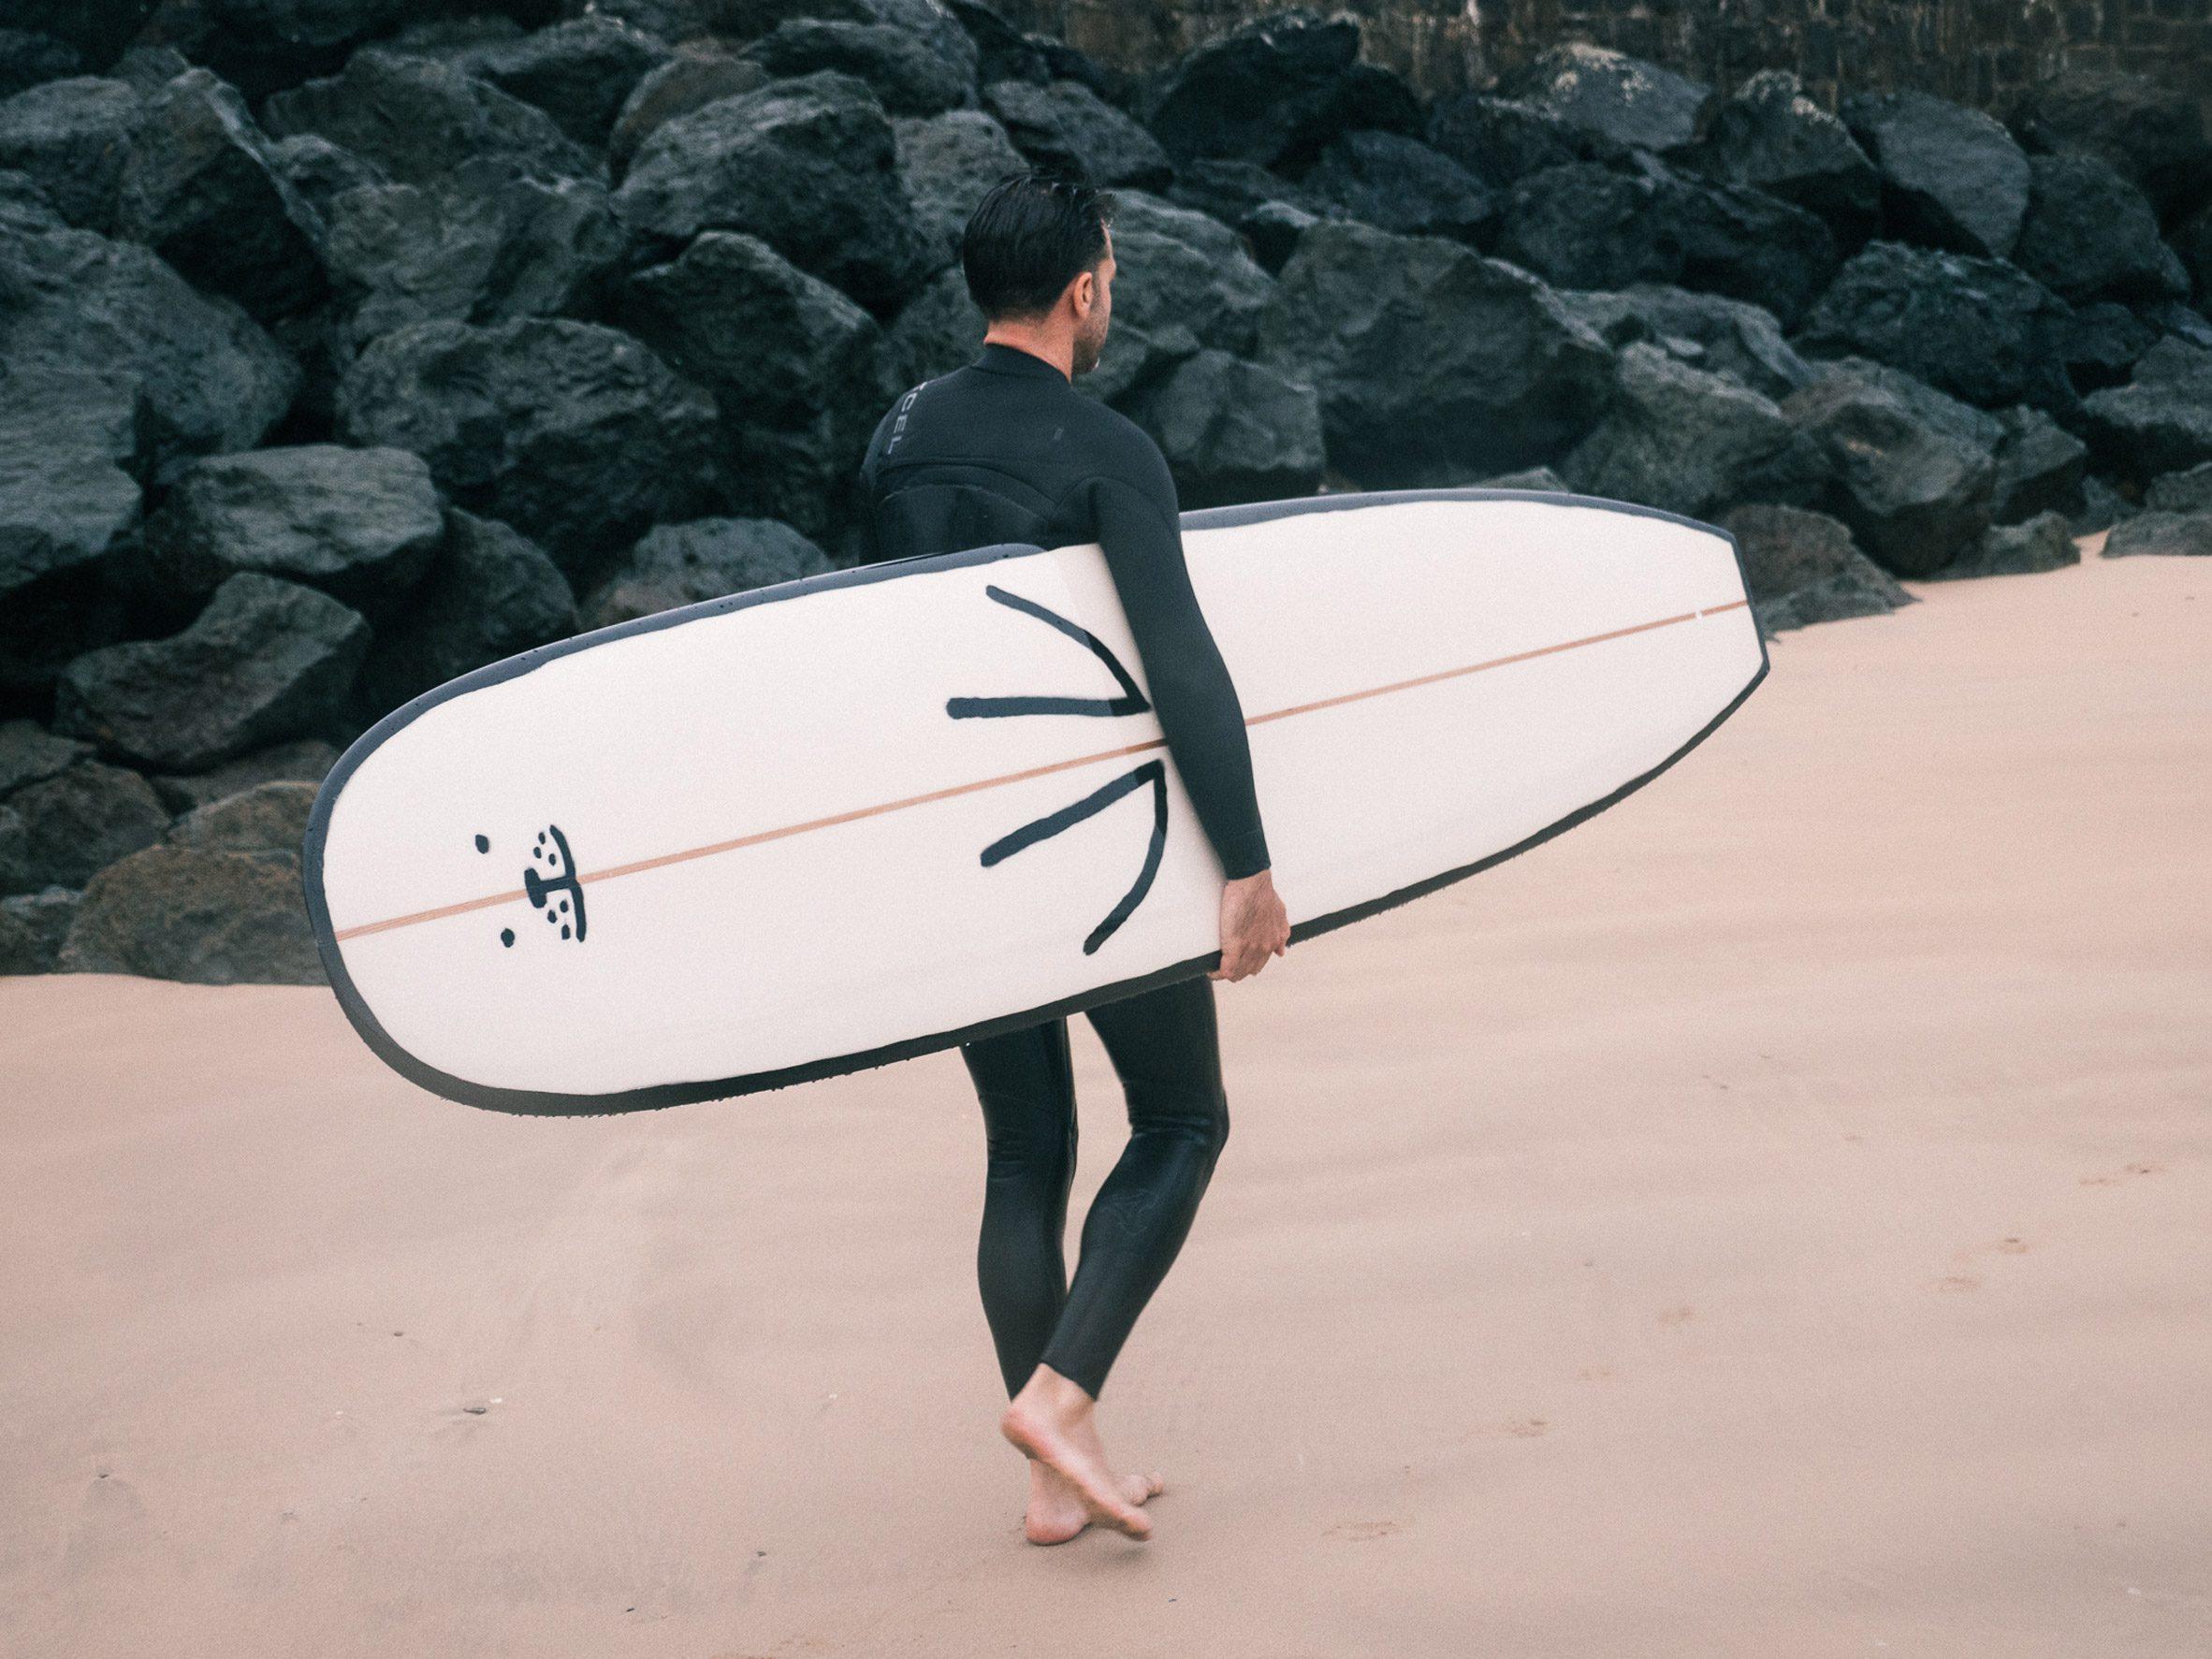 A surfer carries the seal surfboard across a beach